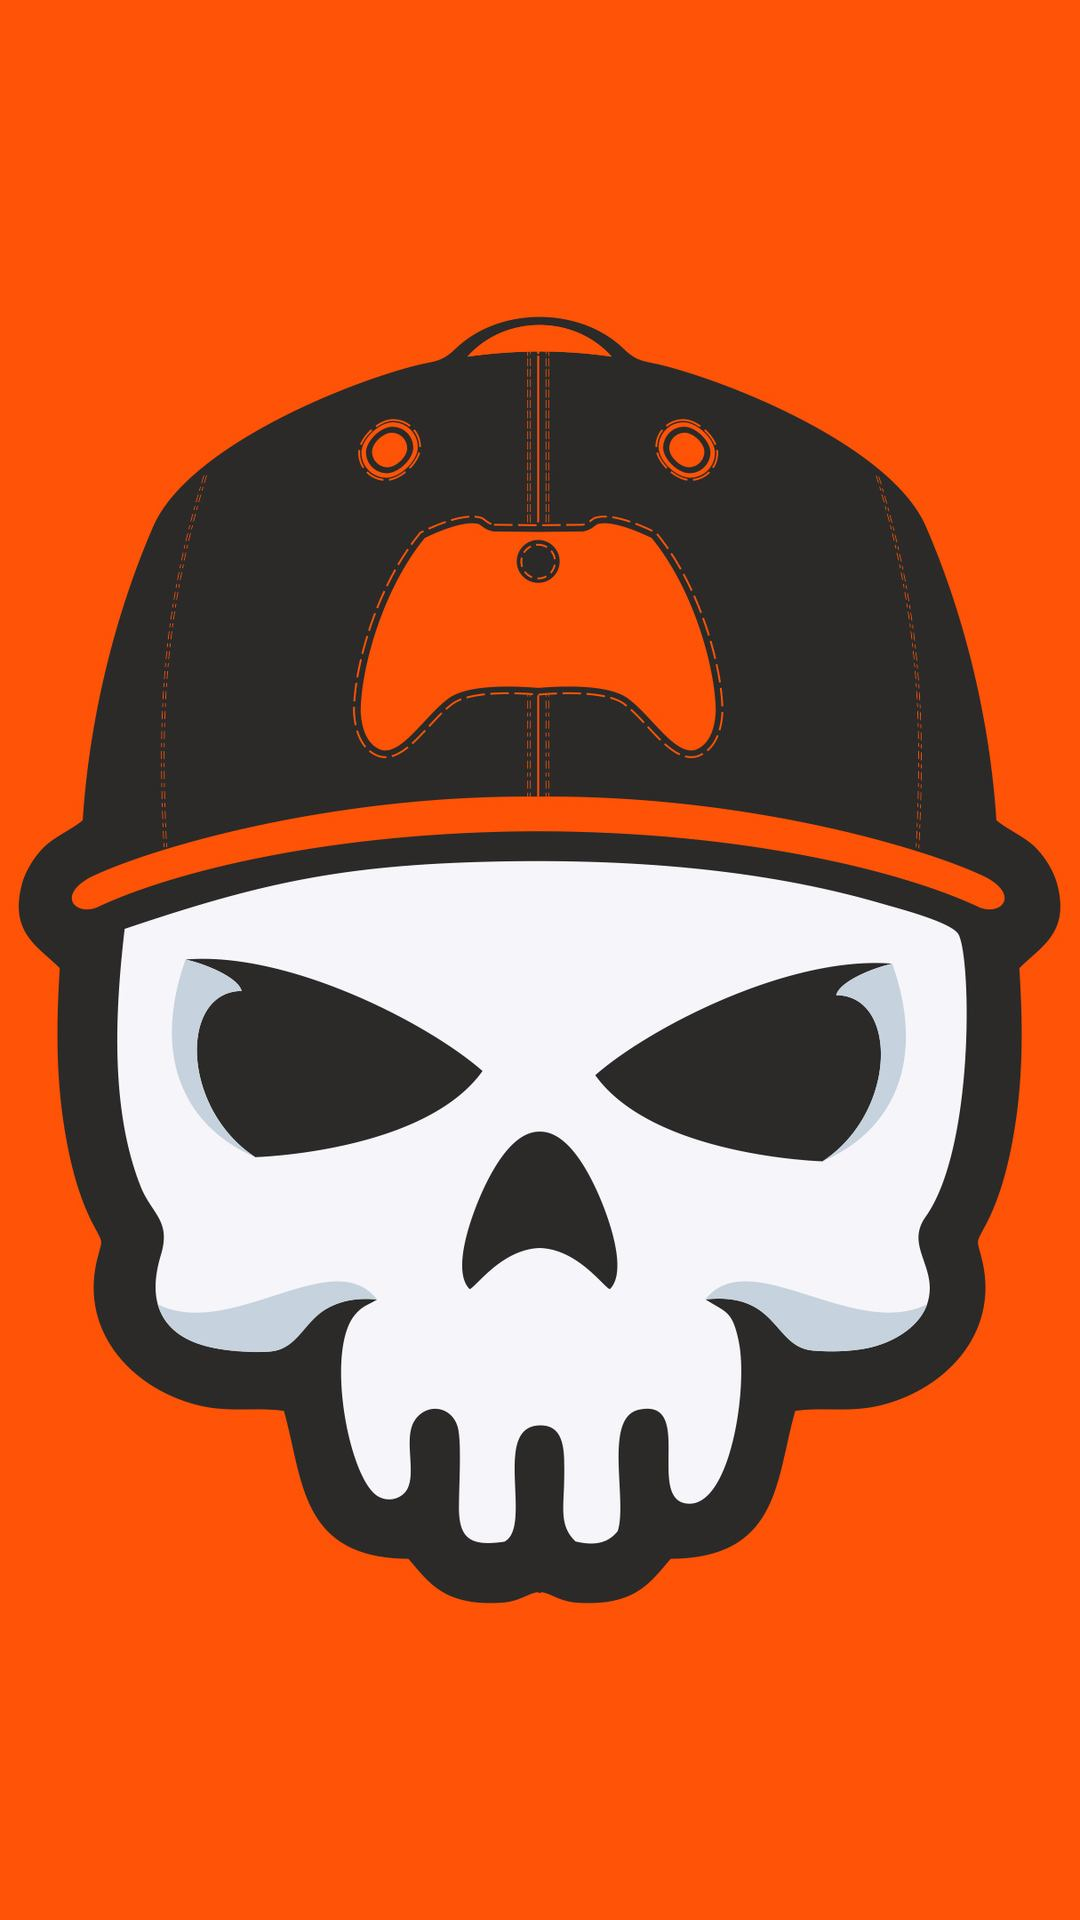 gamer skull minimal 4k hx 1080x1920 - Pack de Fondos de Pantalla Minimalistas (+100 Imagenes)